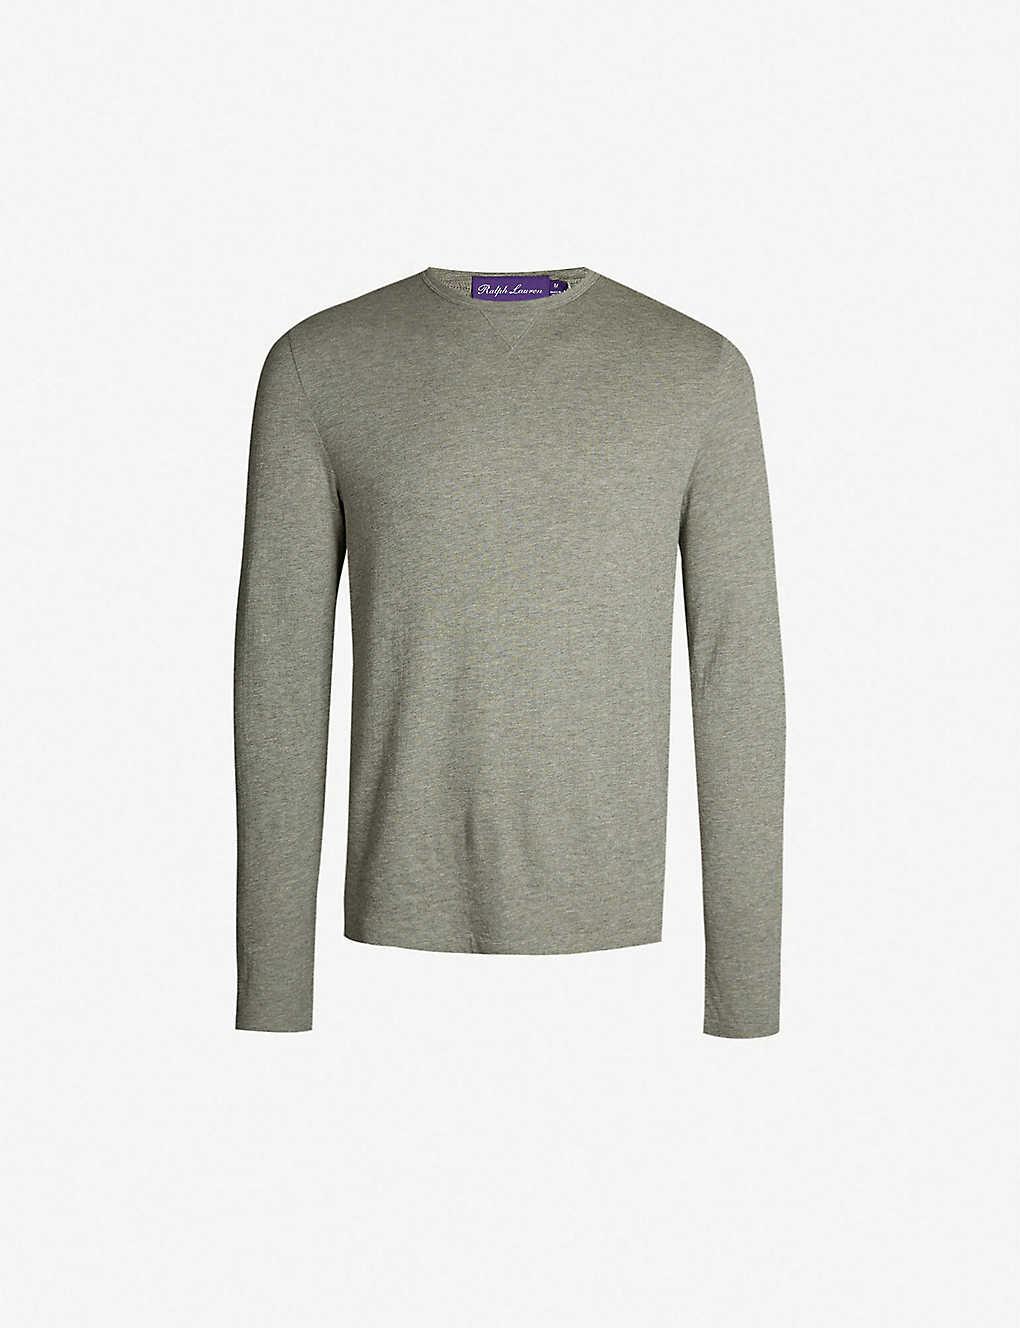 Ralph Lauren Jersey Polo Sweatshirt Crewneck wPX0k8On